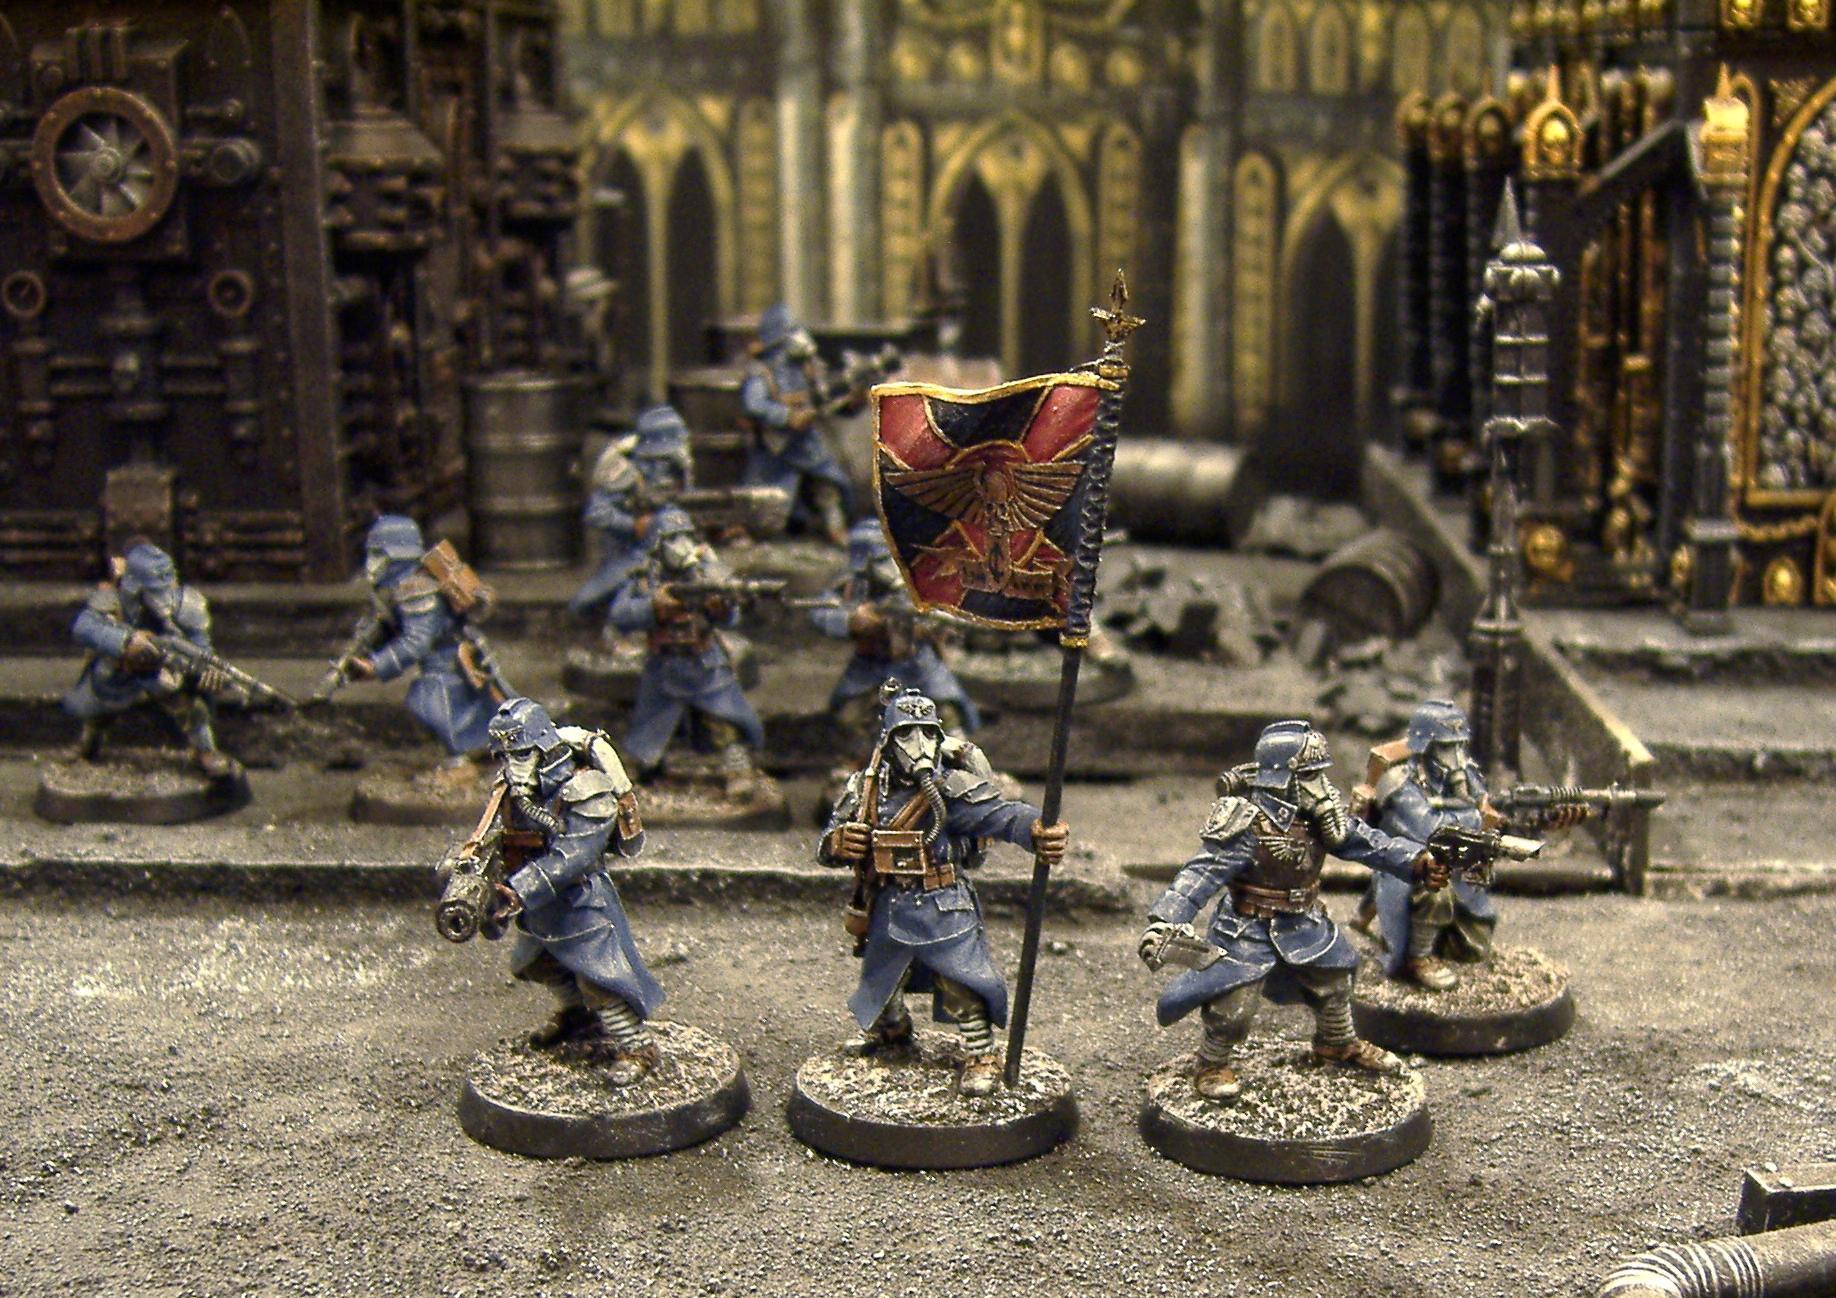 Death, Death Korps of Krieg, Forge World, Guard, Imperial, Imperial Guard, Korps, Leman Russ, Tank, Terrain